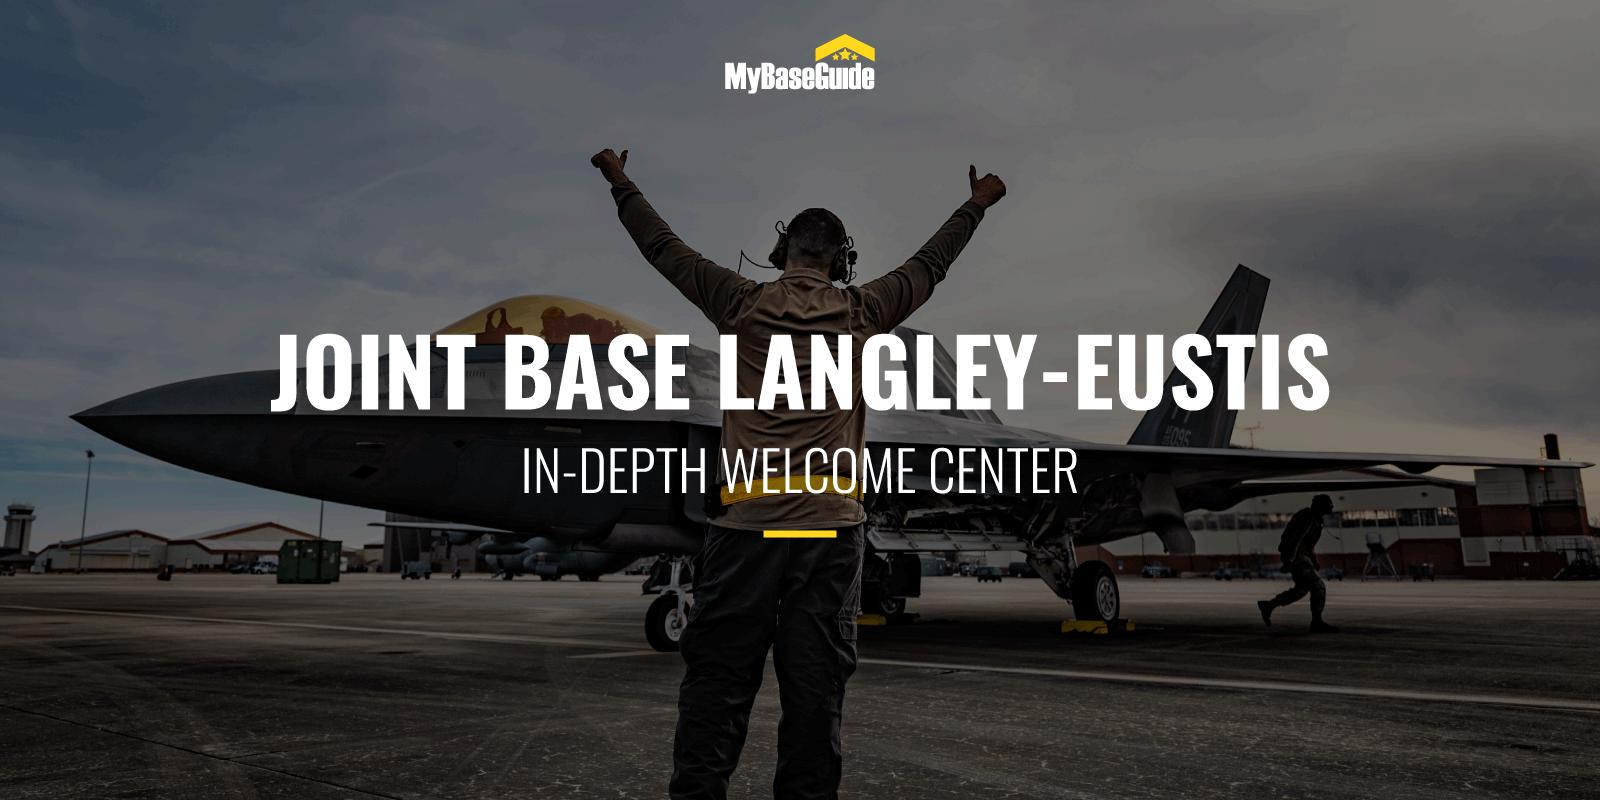 Joint Base Langley-Eustis: In-Depth Welcome Center